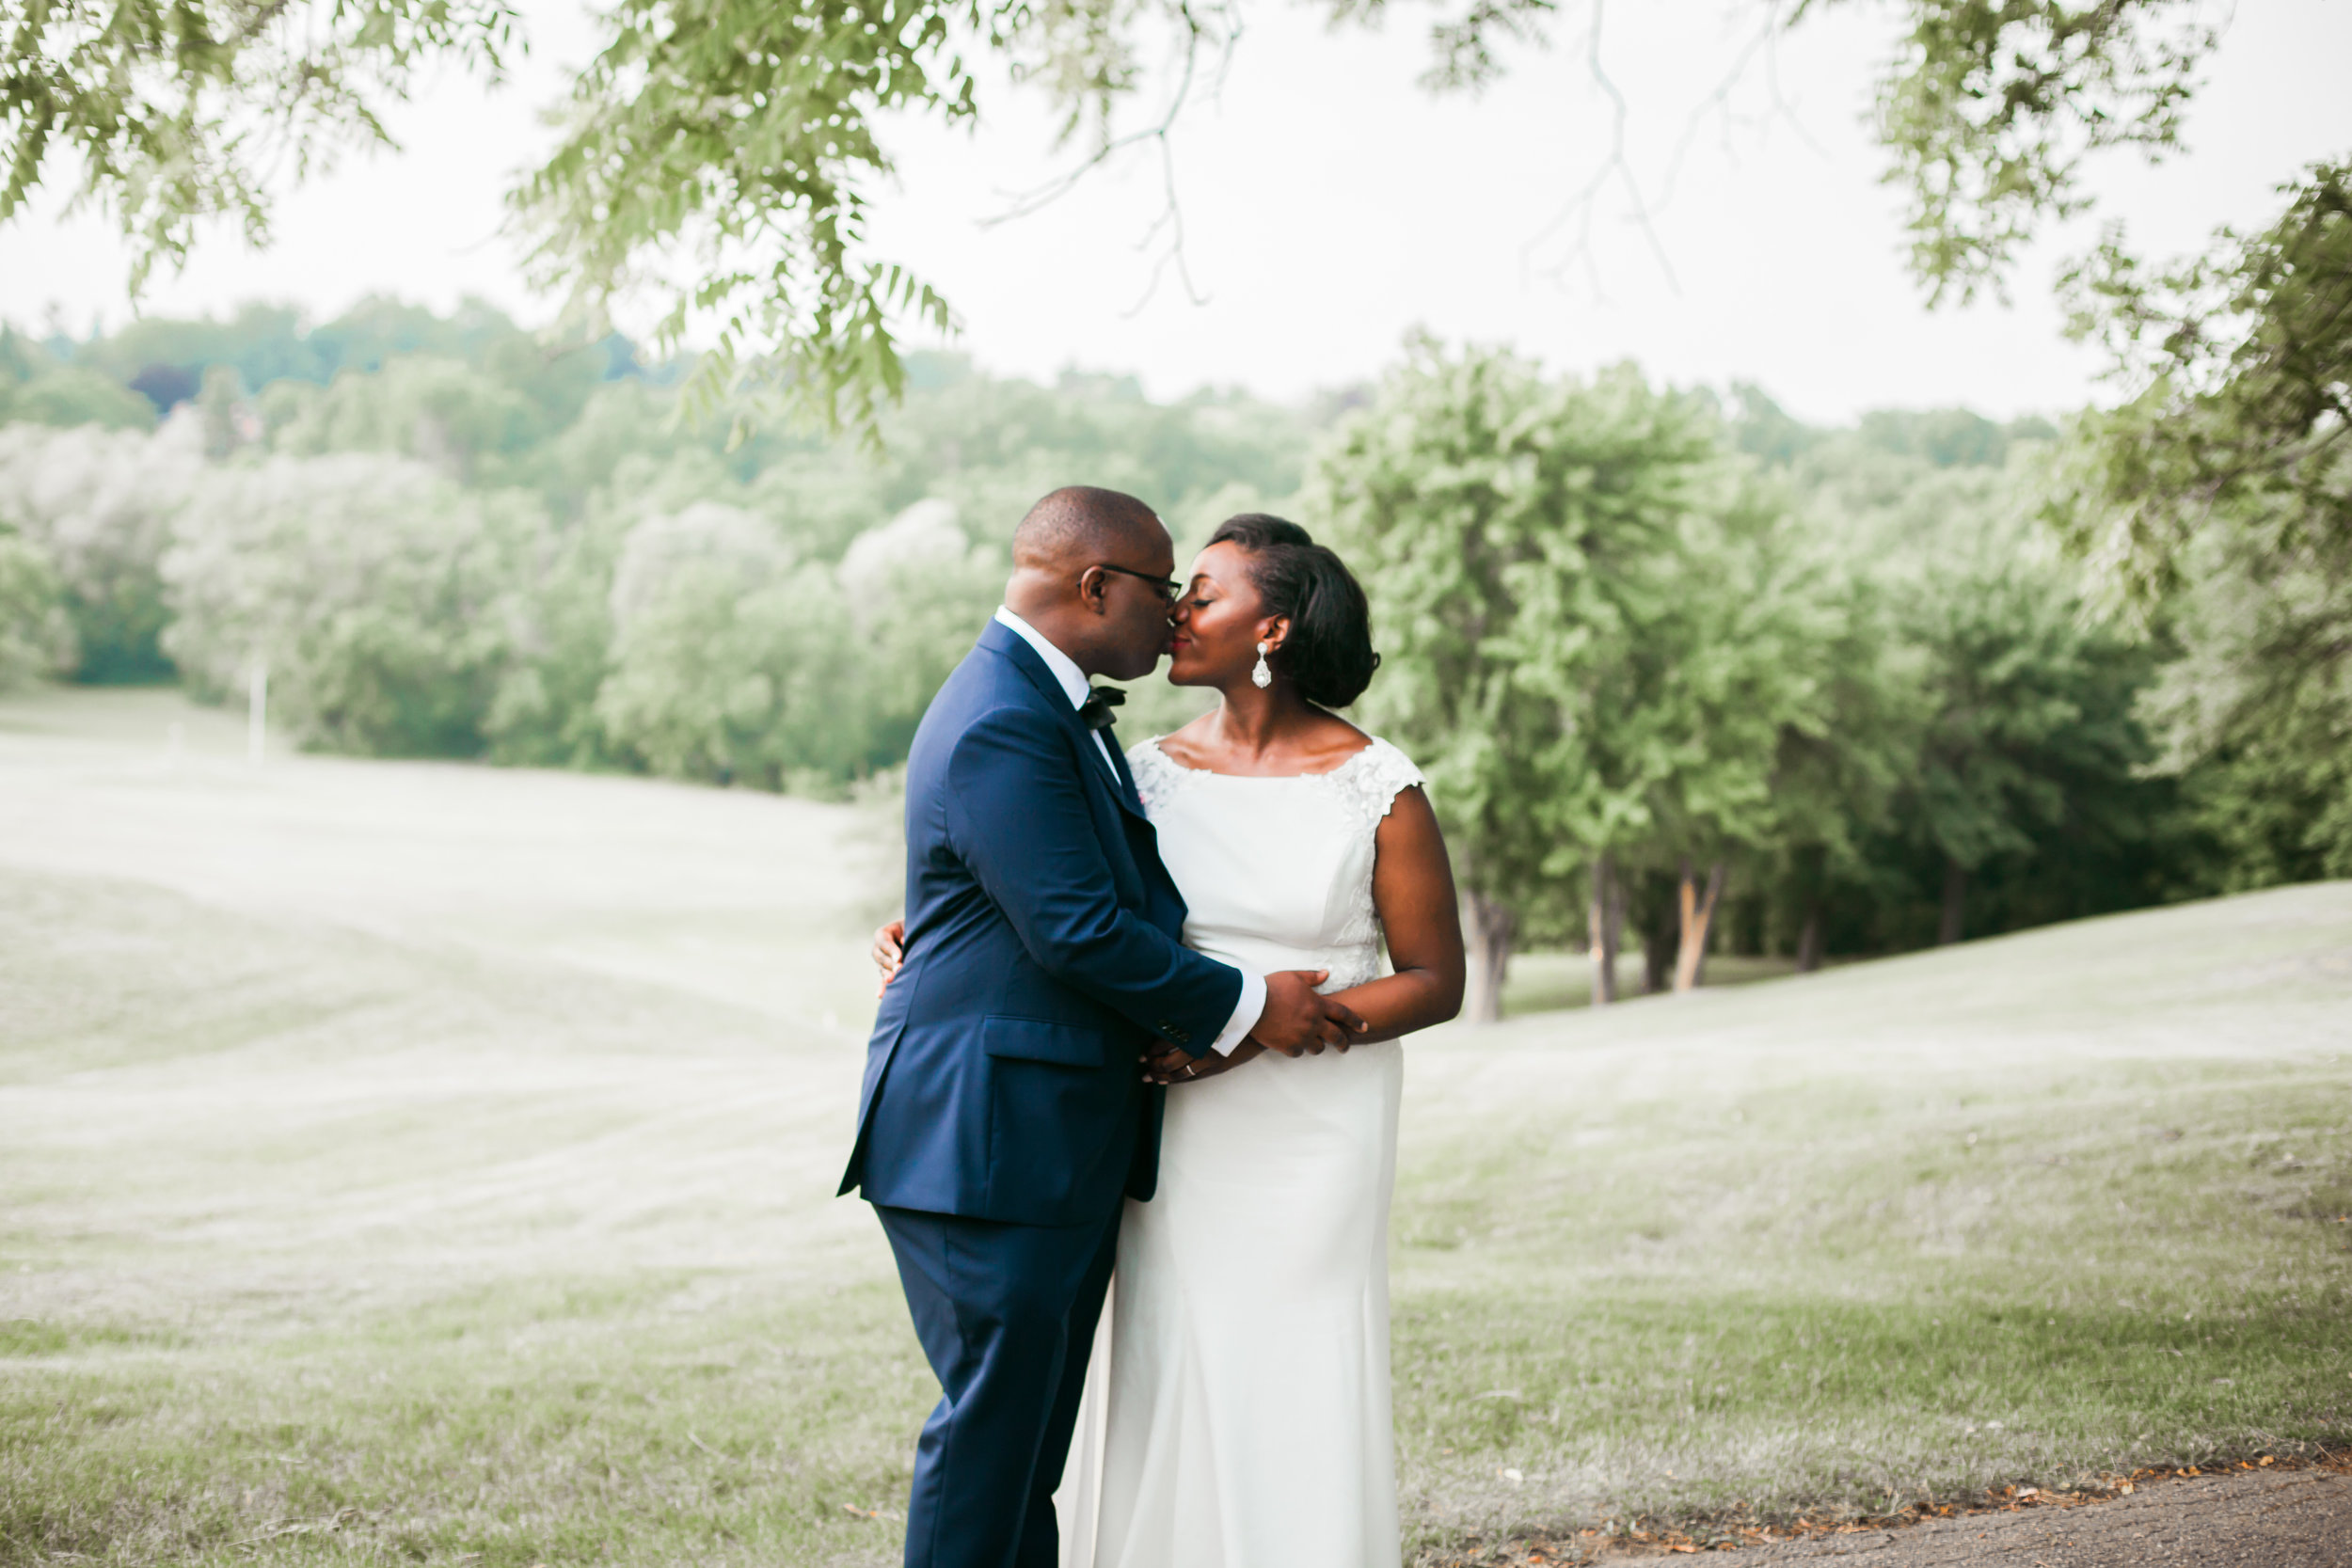 Wedding Photography Kenyan Canadian Photographer Karimah Gheddai Tyndale University College African Black couples Portraits Blue Suit International Multicultural Ontario Toronto Canada